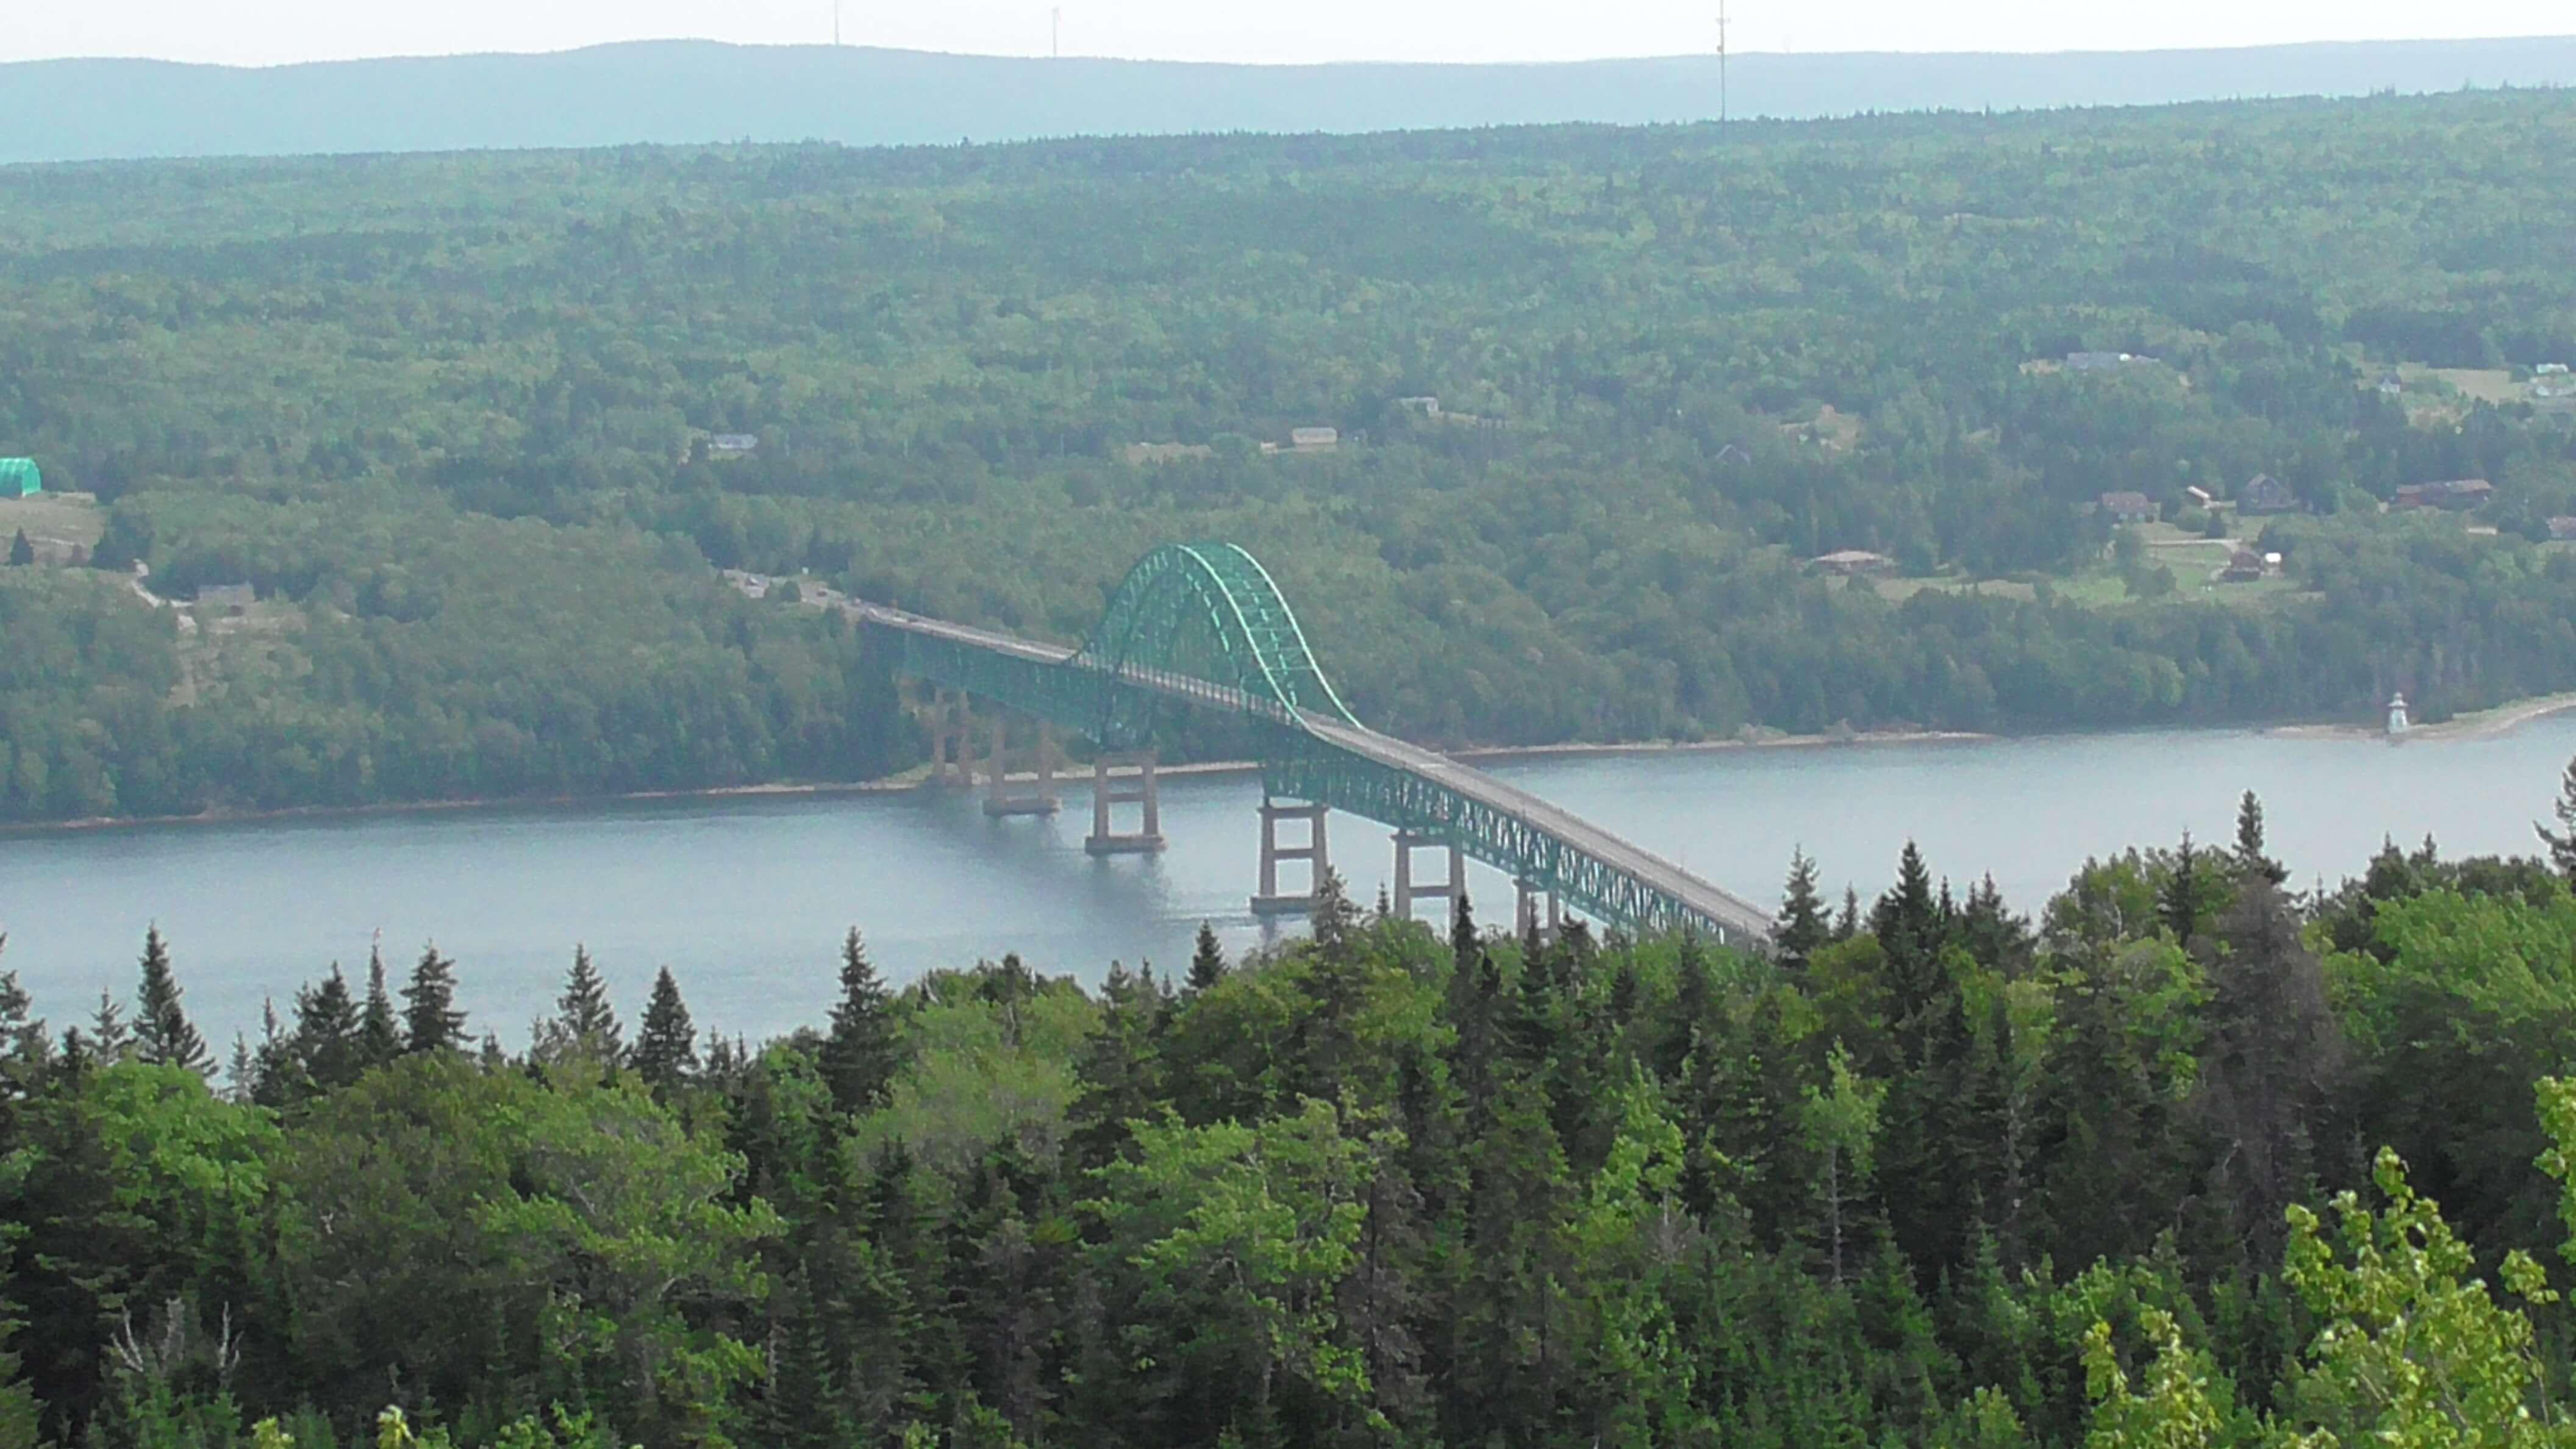 Bridge near east end of Cape Bretton Highlands National Park